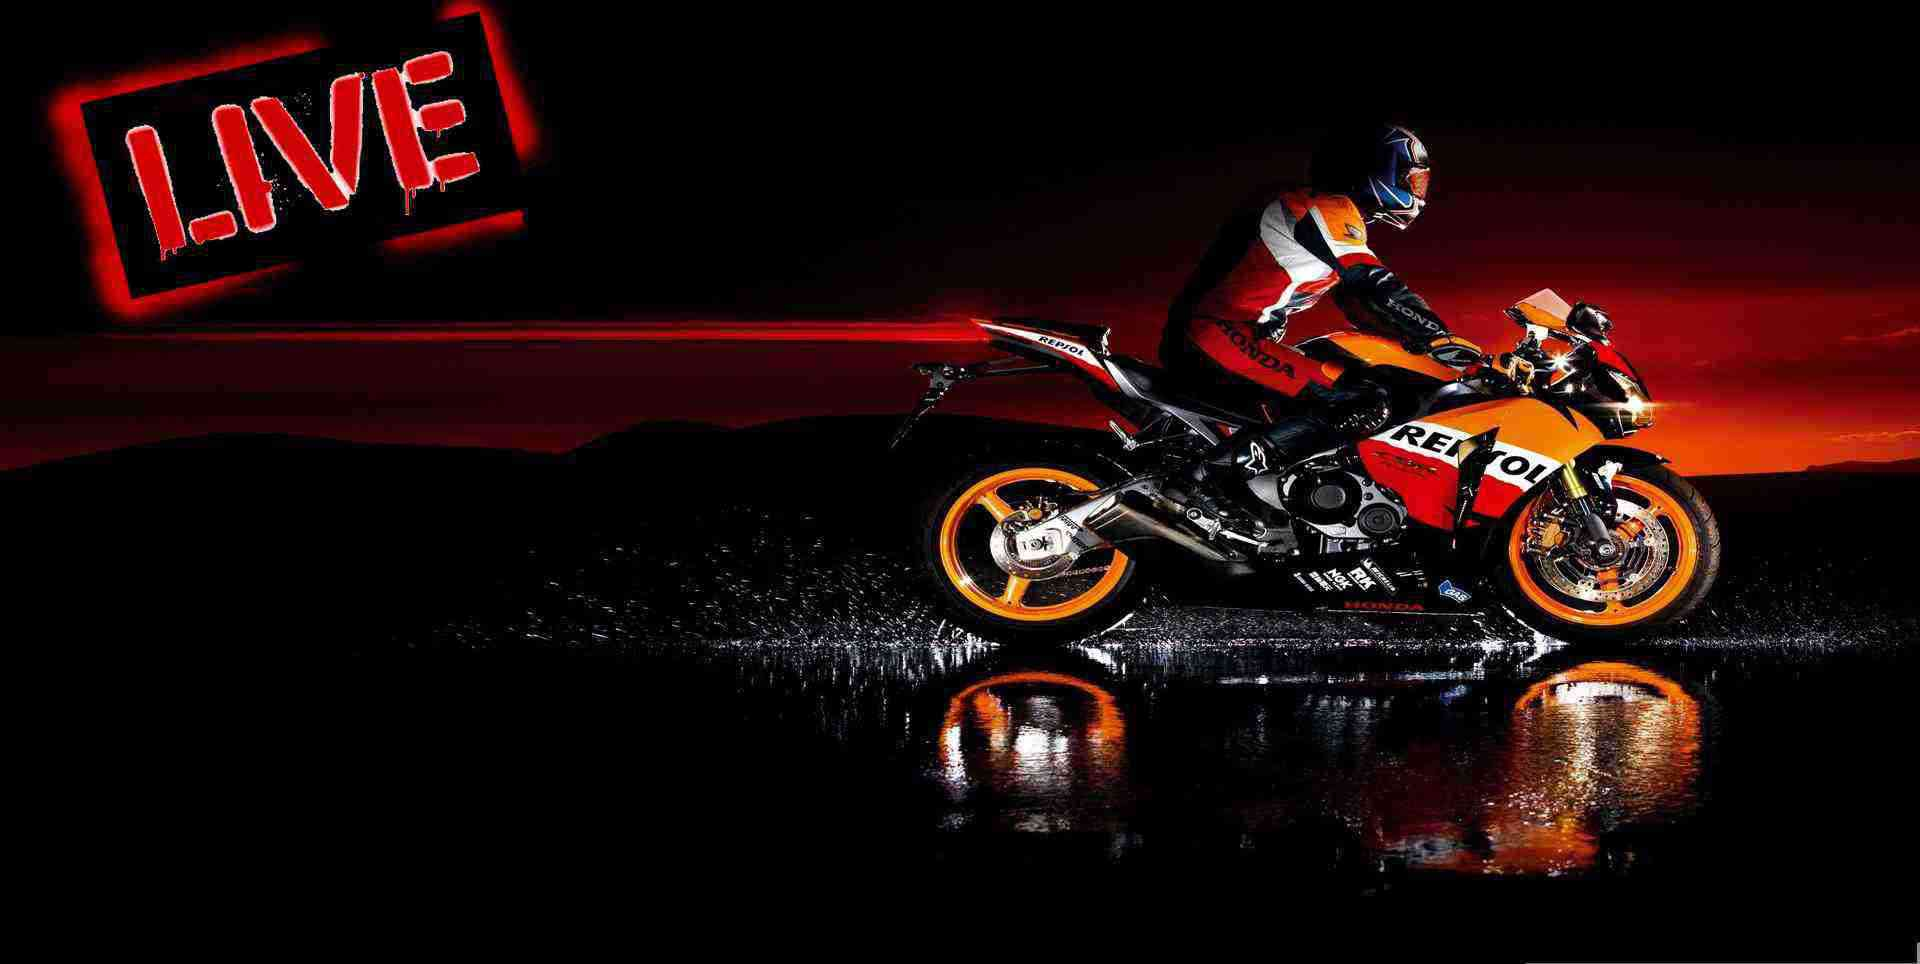 Motogp Red Bull Grand Prix 2015 Live Sreaming